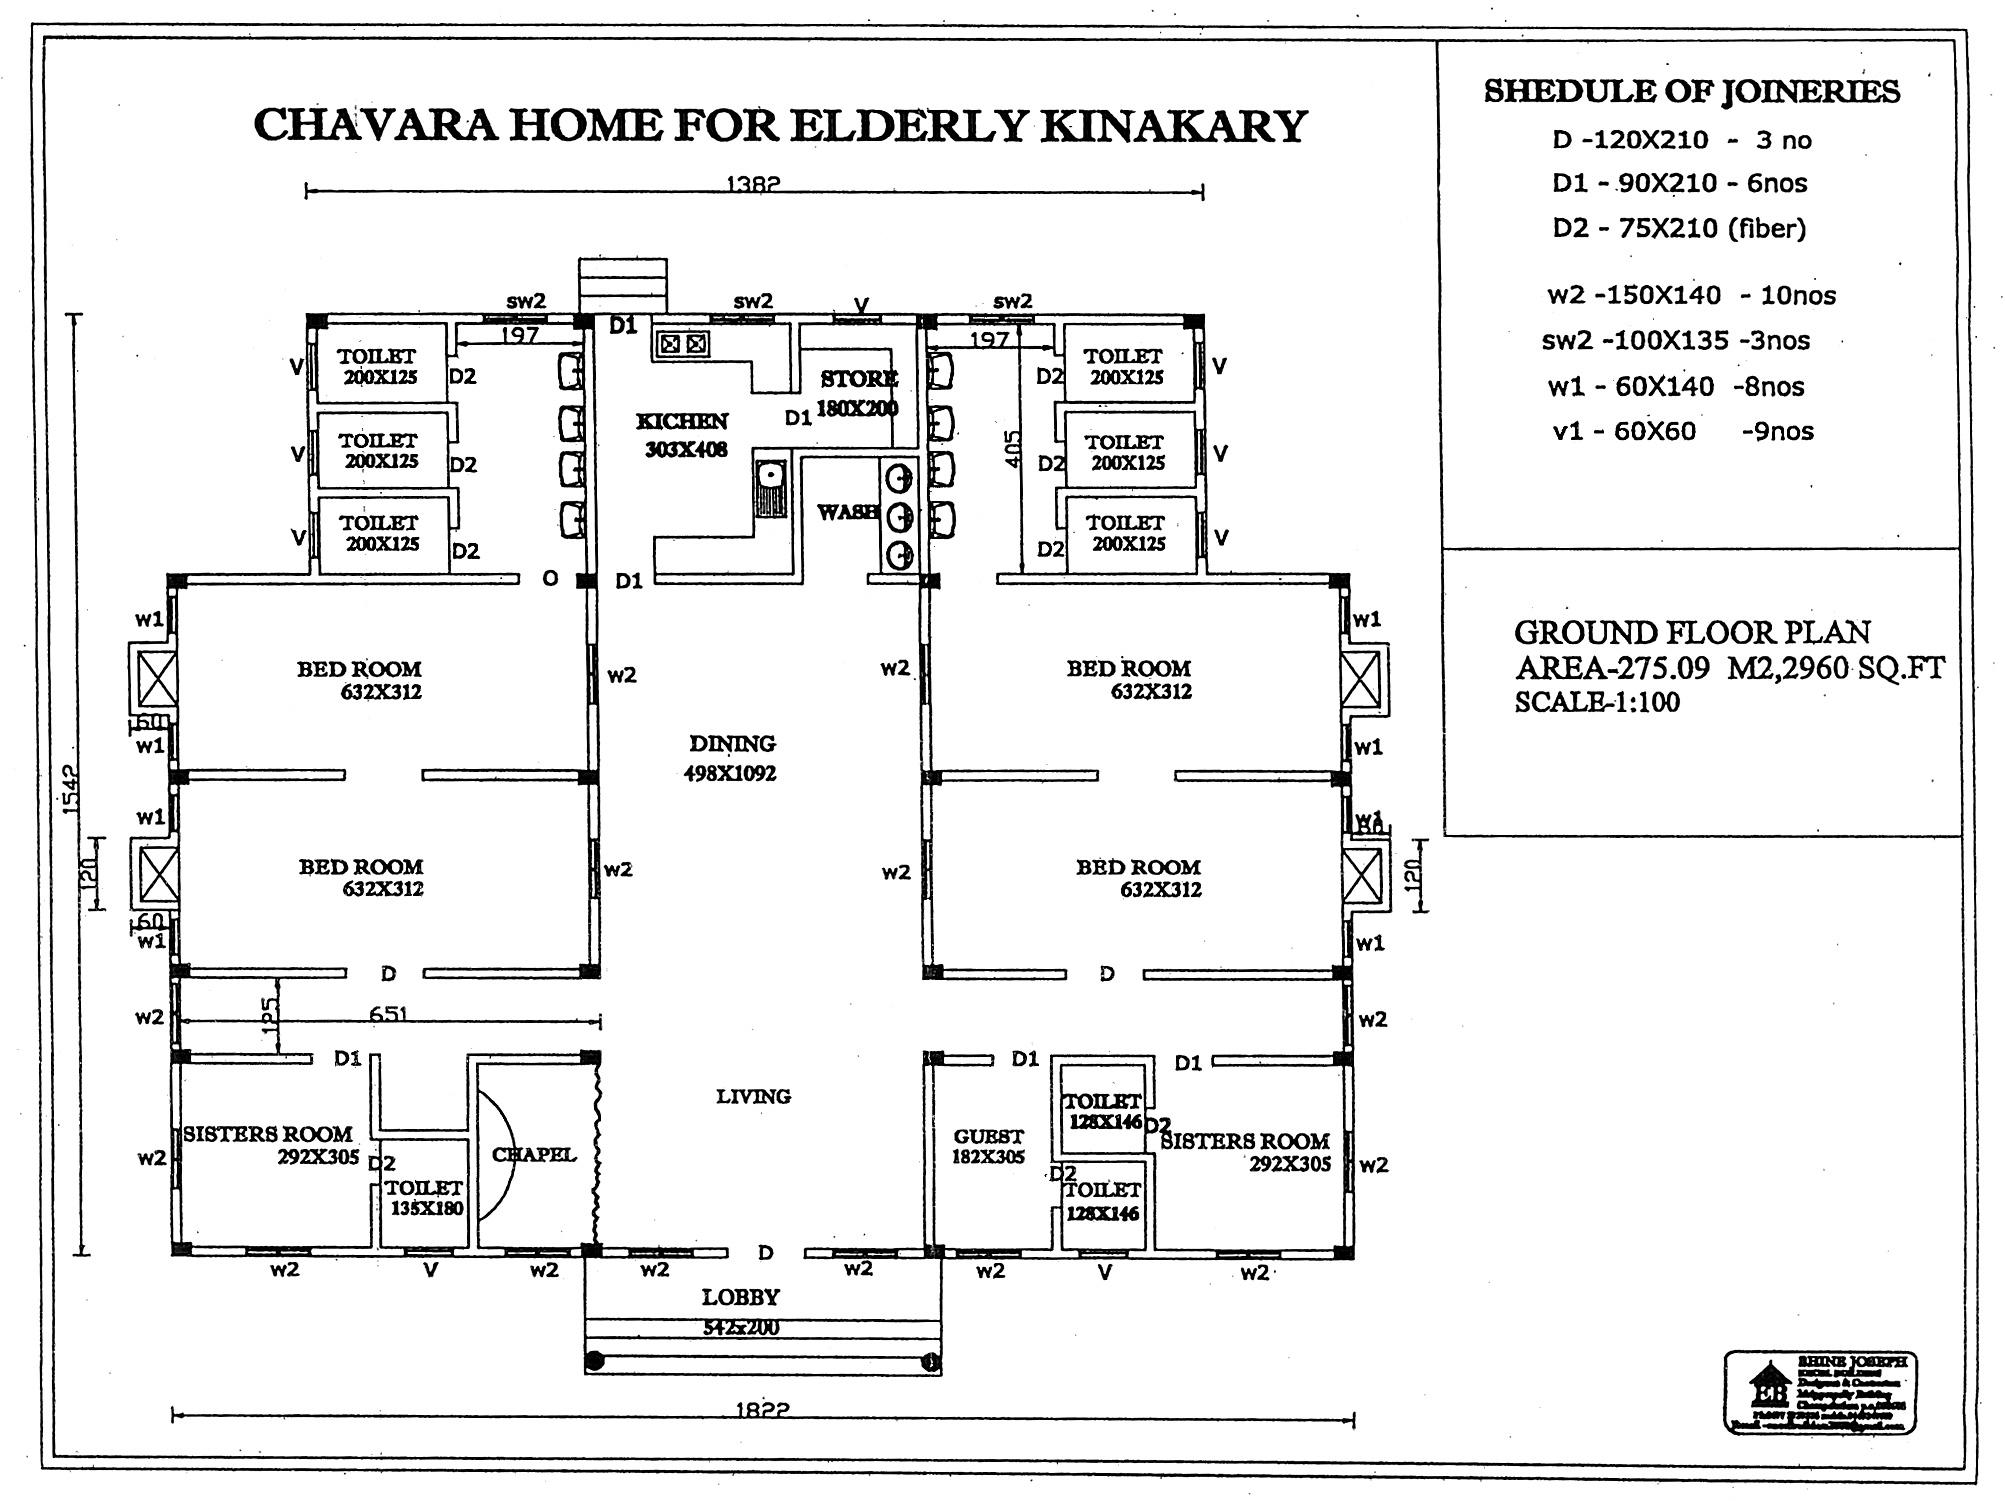 Chavara Home (planimetria)-